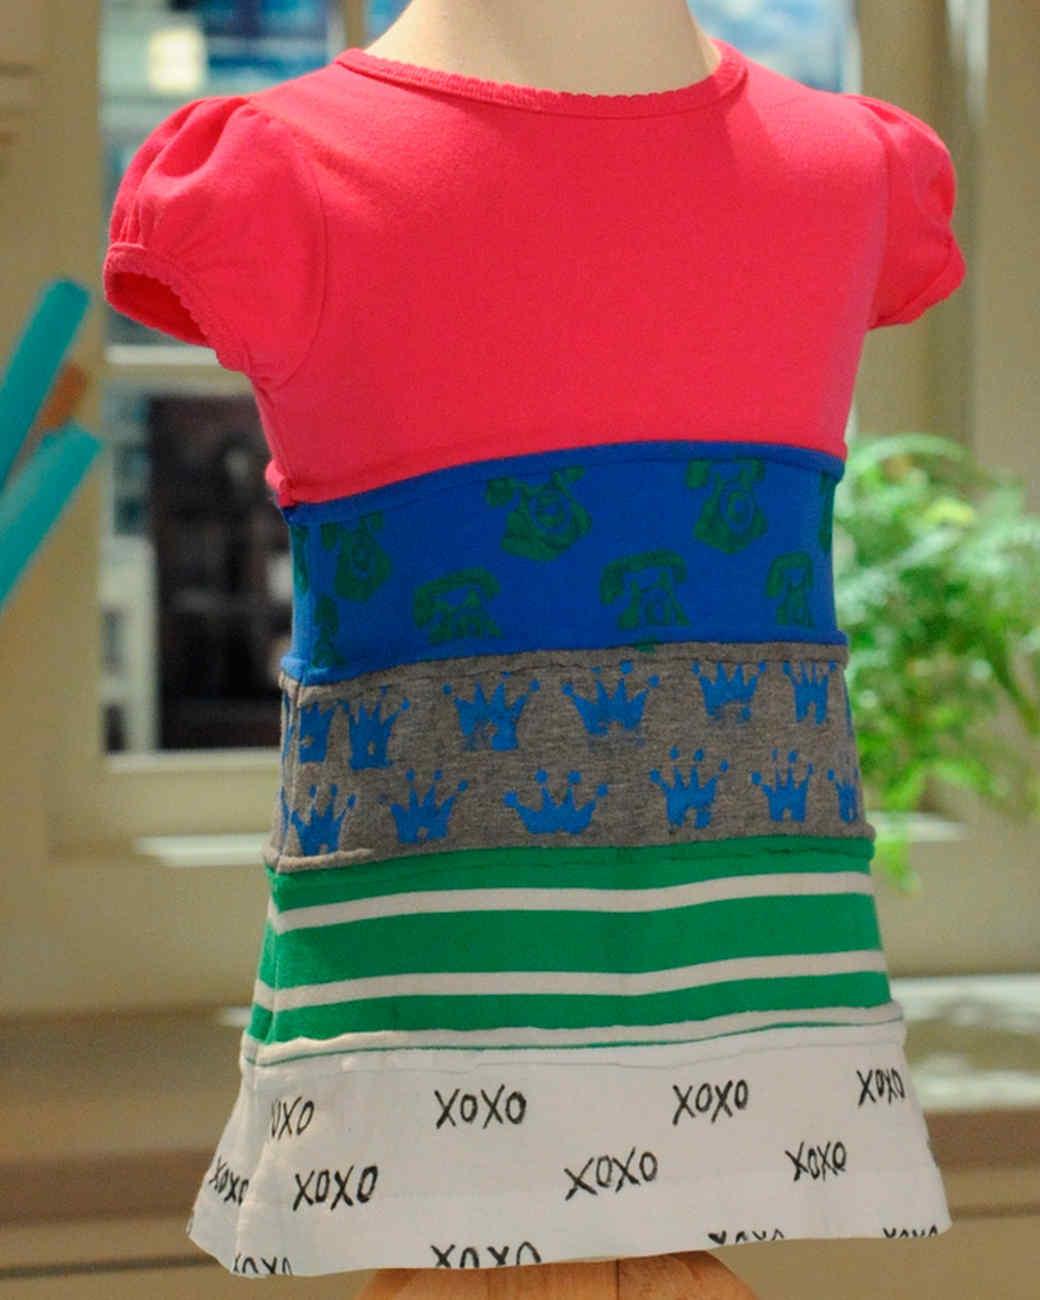 t-shirt-dress-mslb7071.jpg